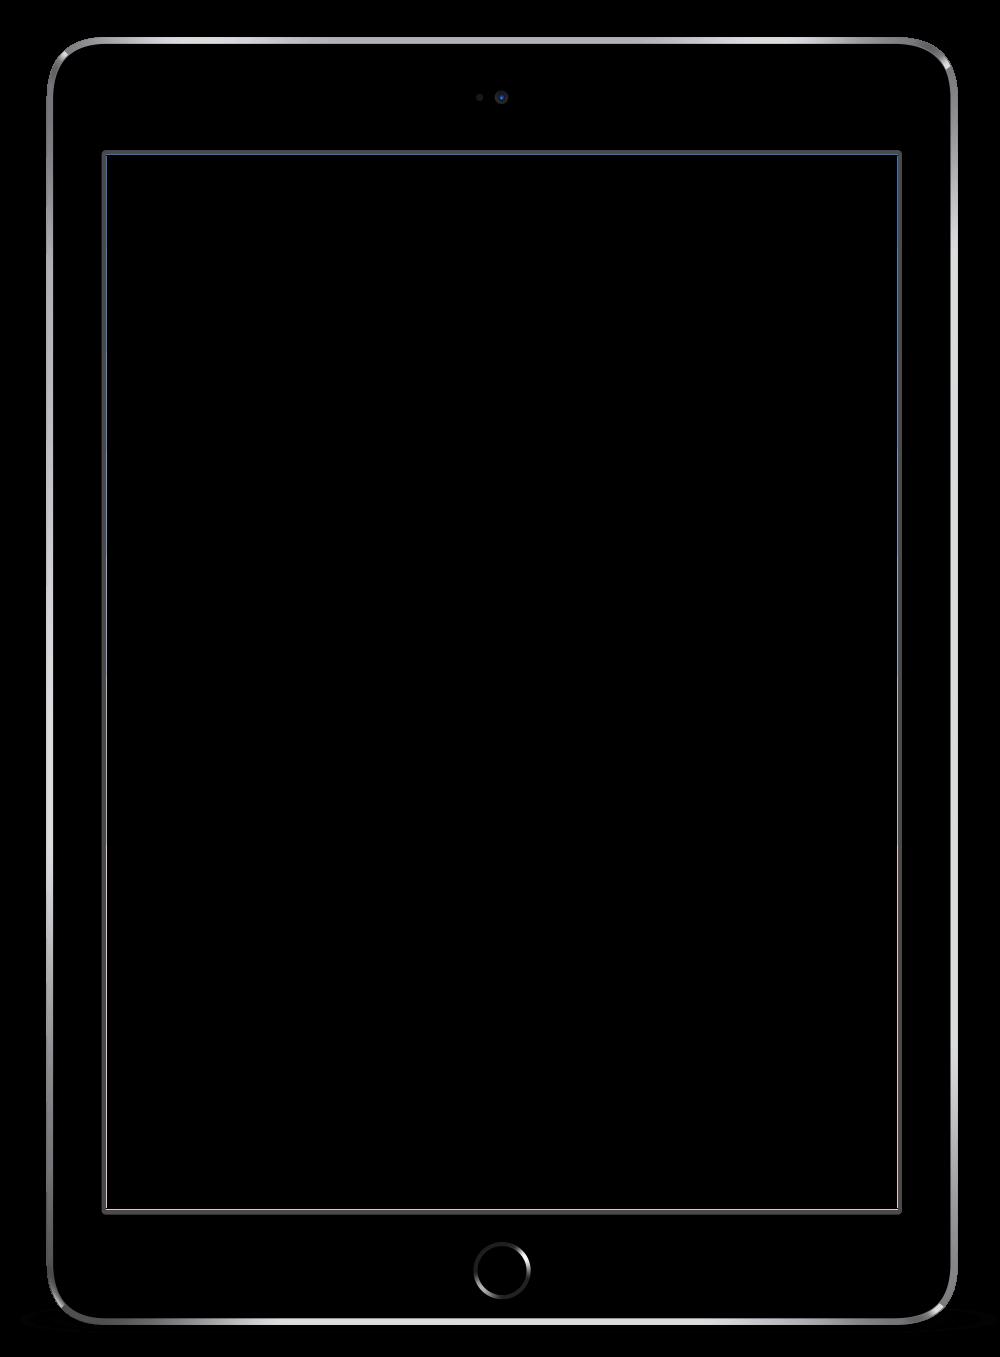 ipad-front